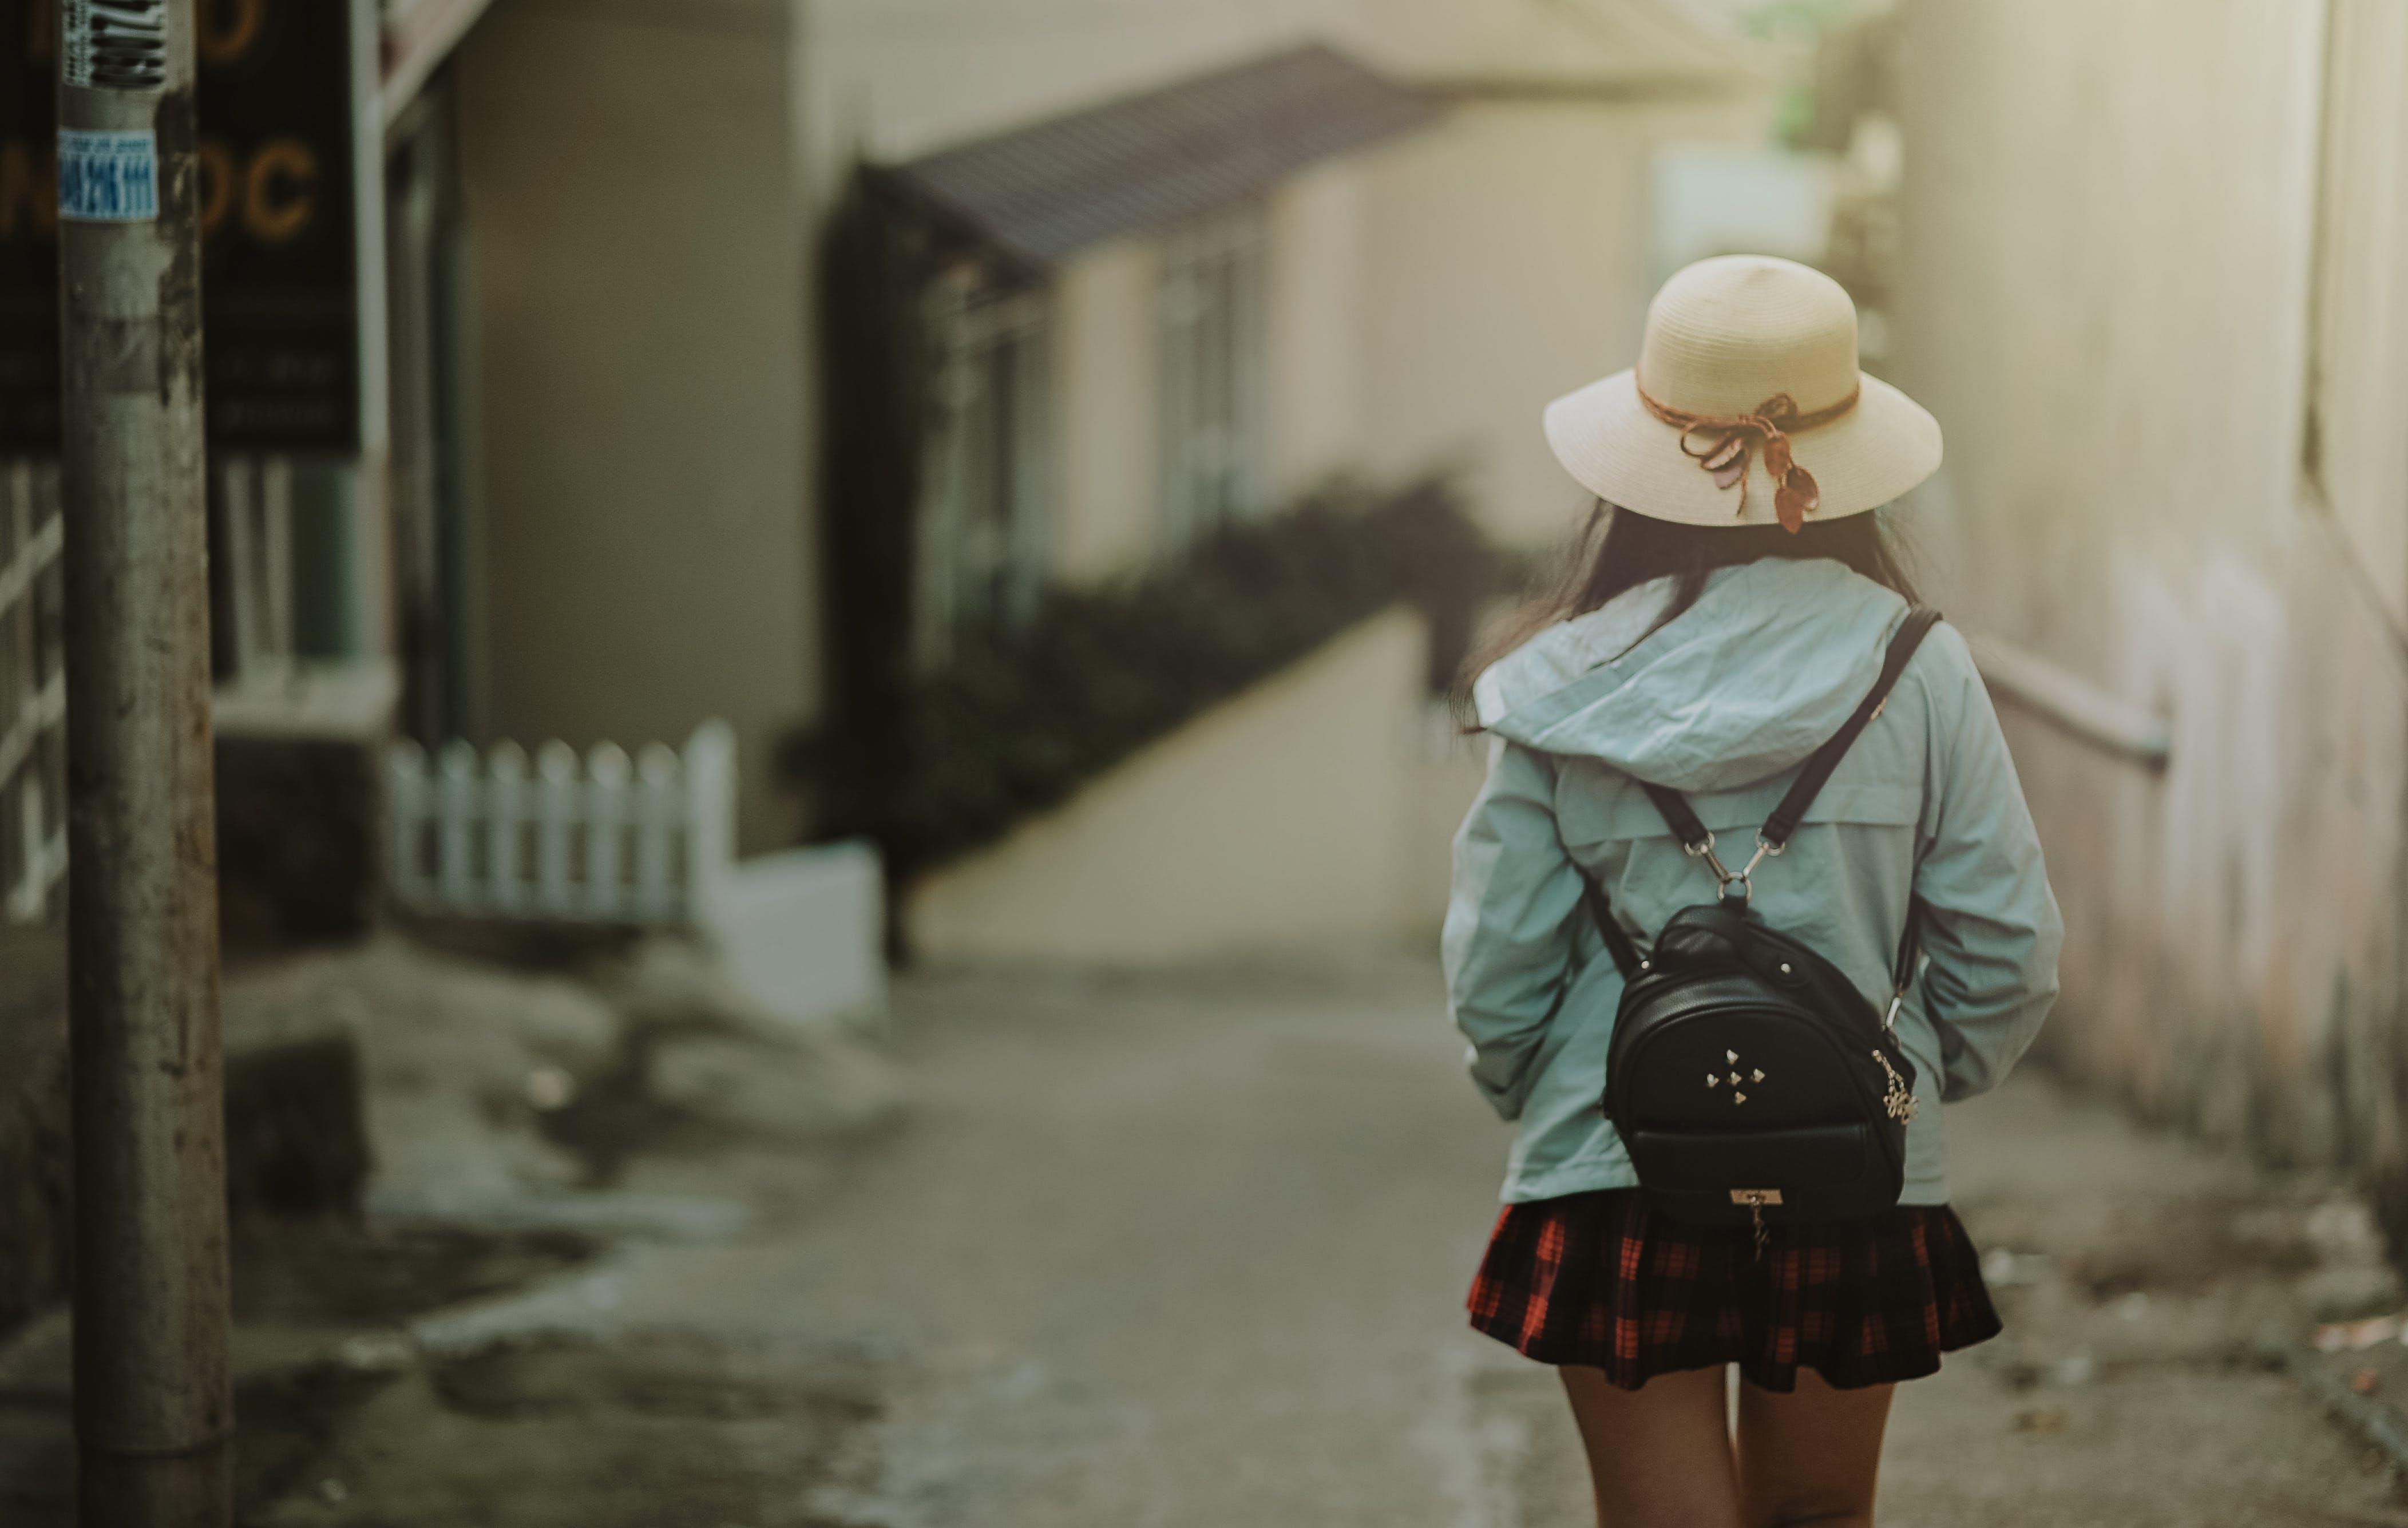 Girl in Blue Jacket and Black Leather Knapsack Walking on Street